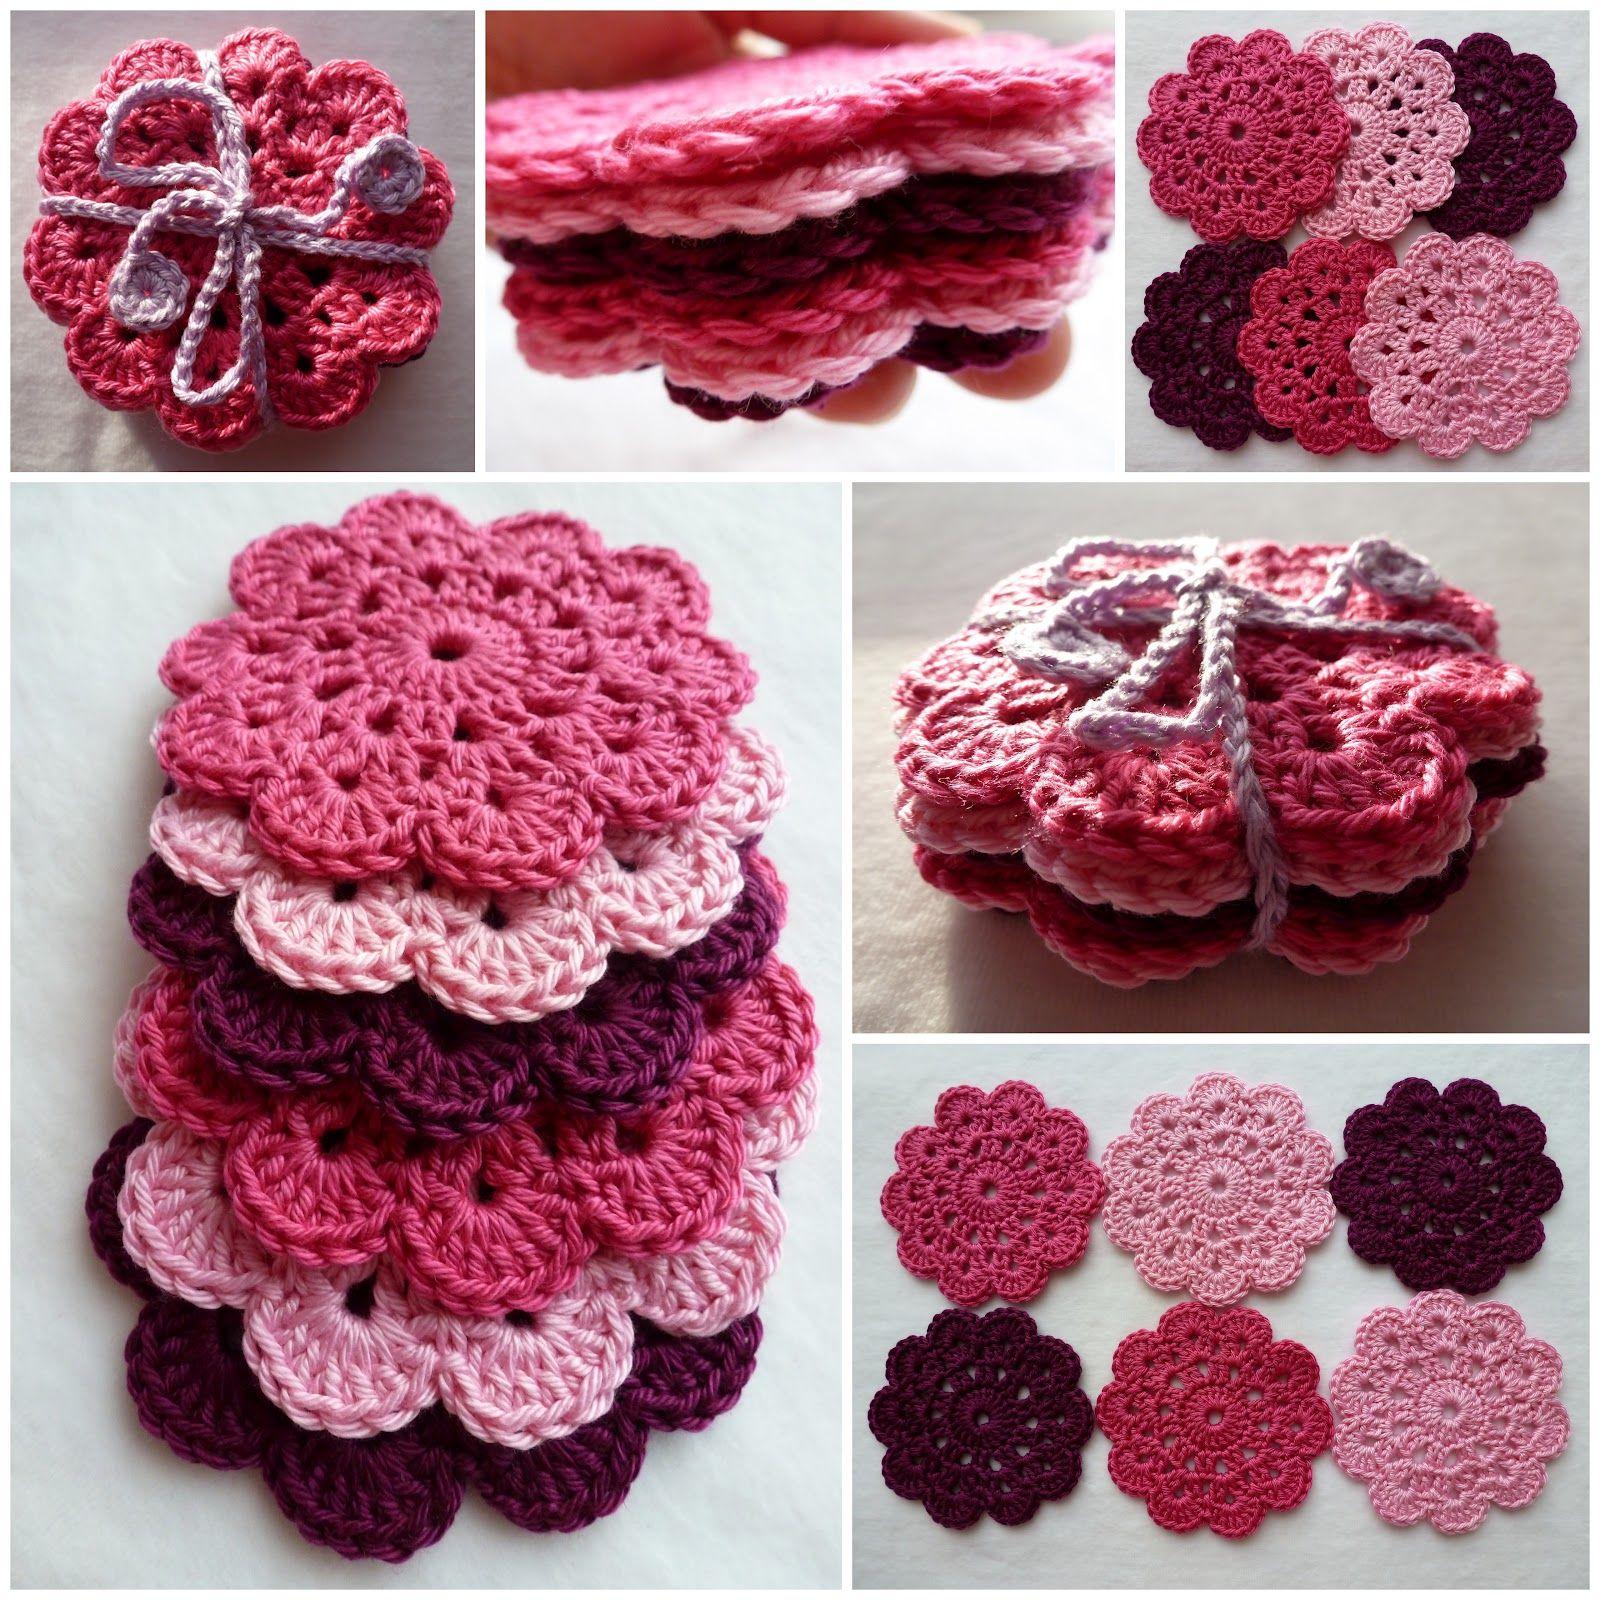 Karin aan de haak: Onderzetter 1893 - Patroon | Crochet - Made by me ...